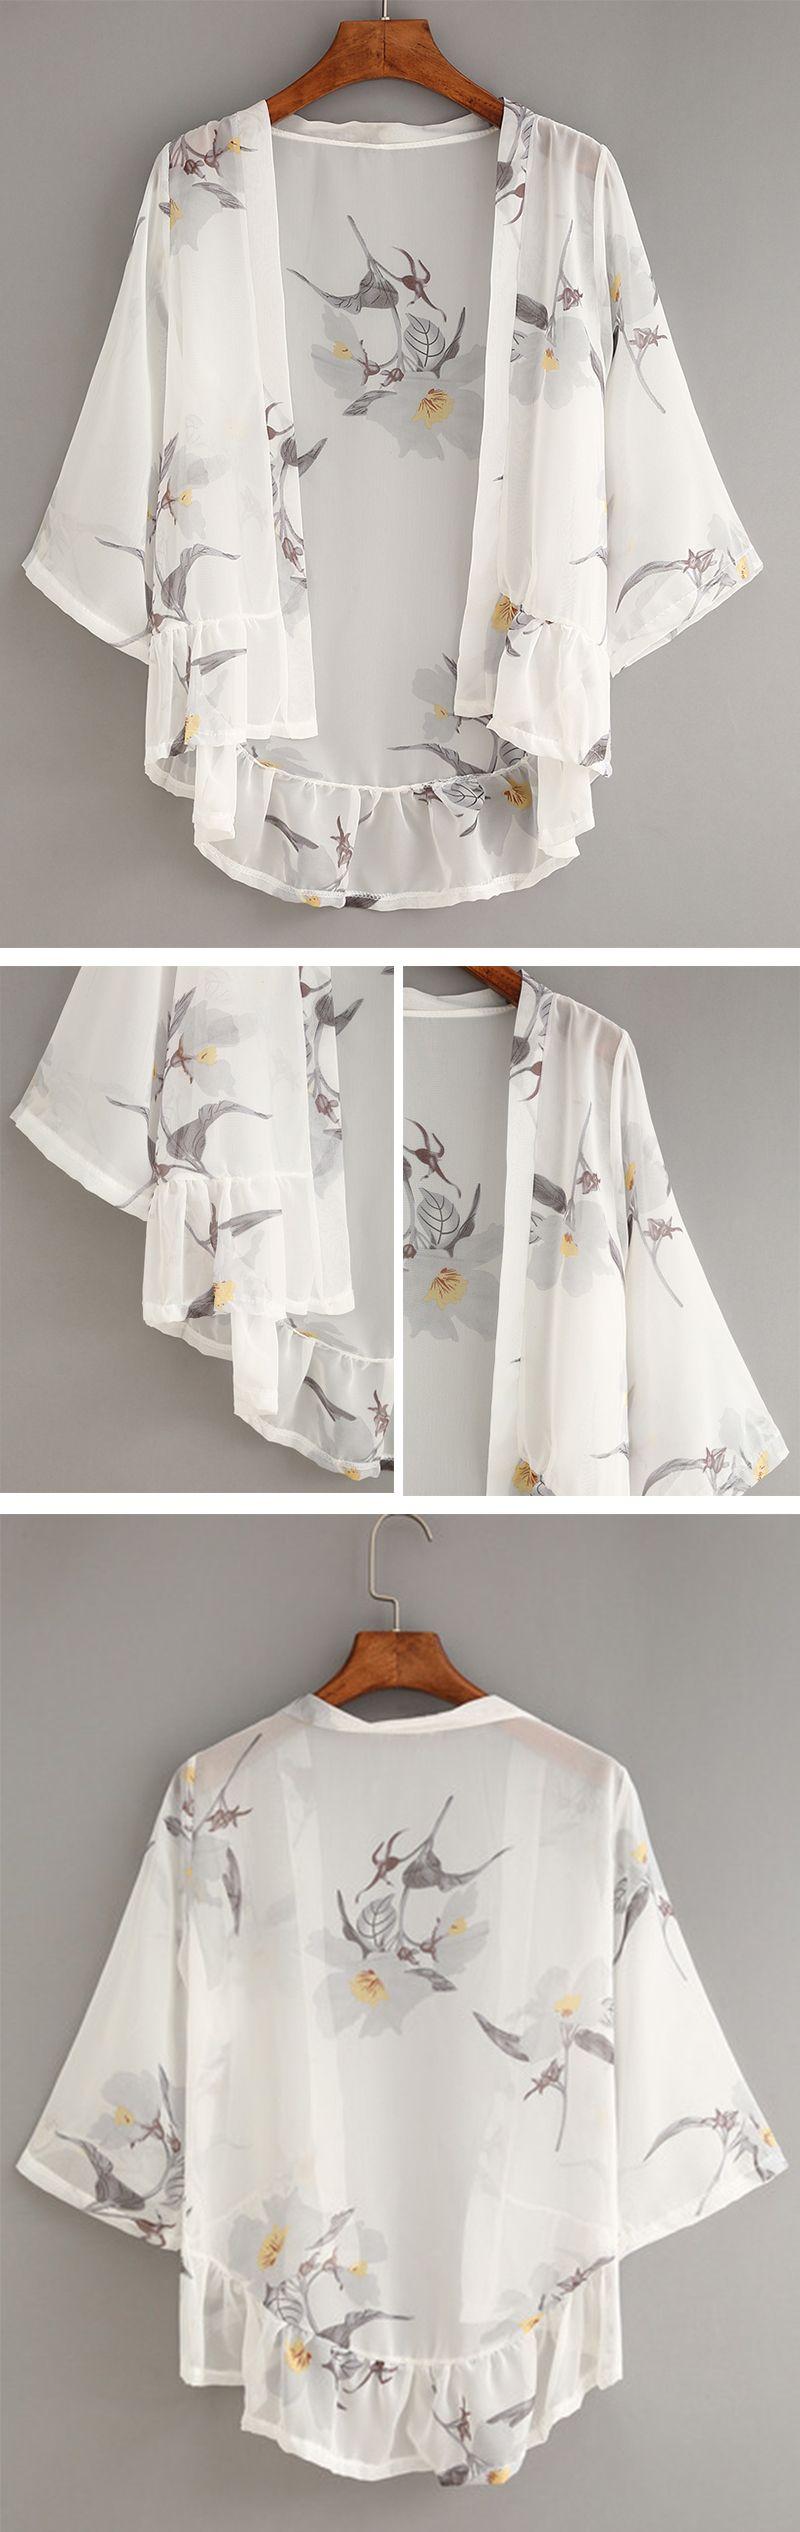 White Flower Print Ruffle Chiffon Kimono … | Pinteres…